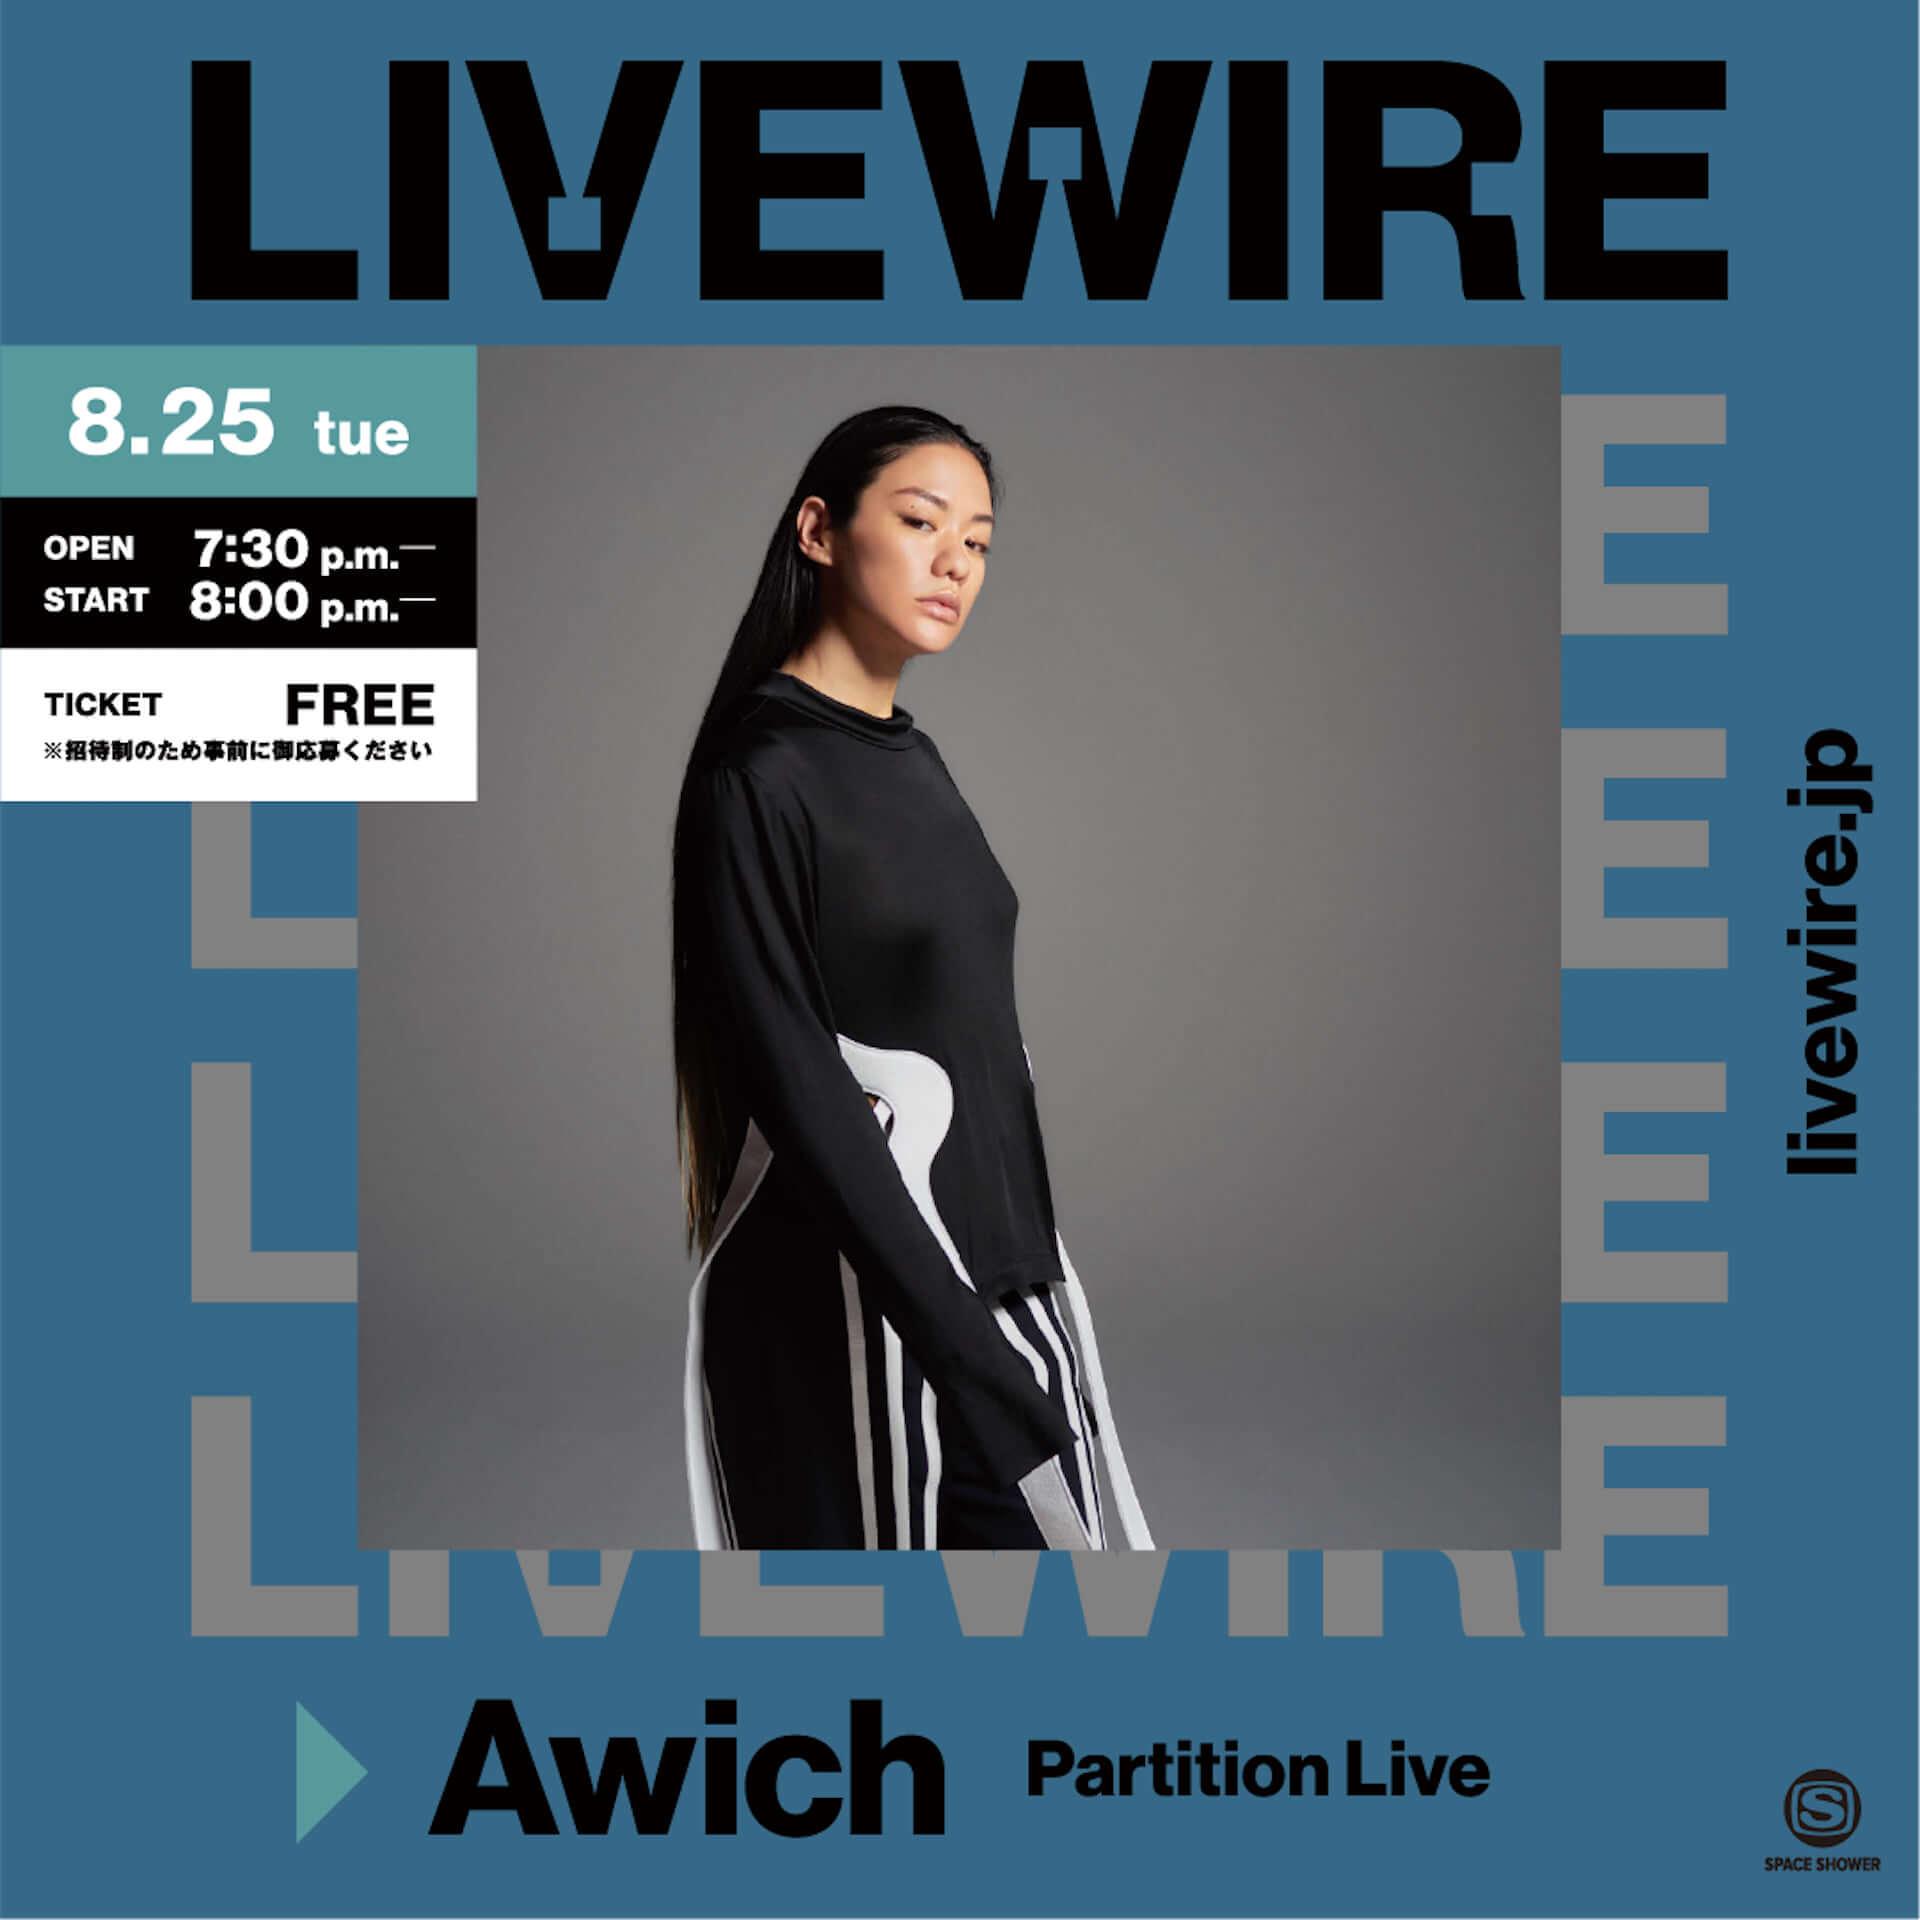 "Awich出演の<LIVEWIRE>にSOIL&""PIMP""SESSIONS・社長ら豪華バンドメンバーが登場!フリーチケットが受付開始 music200807_livewire-awich_1-1920x1920"